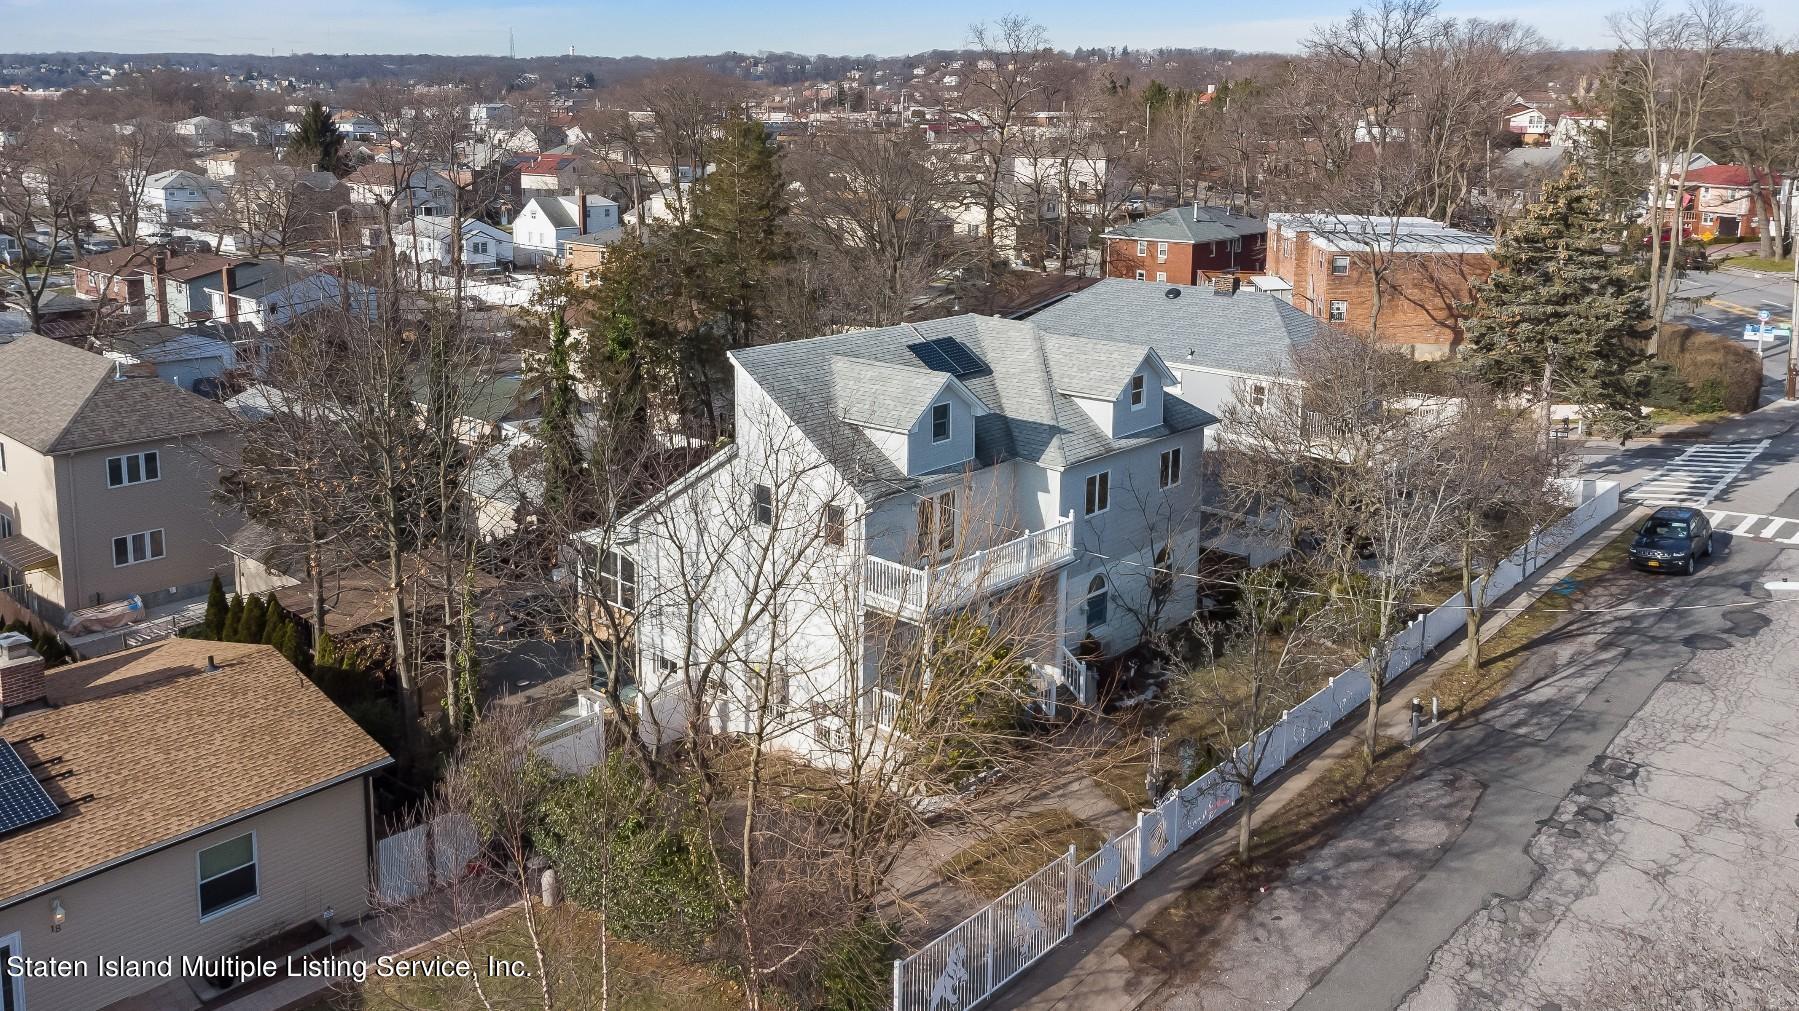 Single Family - Detached 8 Bionia Avenue  Staten Island, NY 10305, MLS-1142818-2